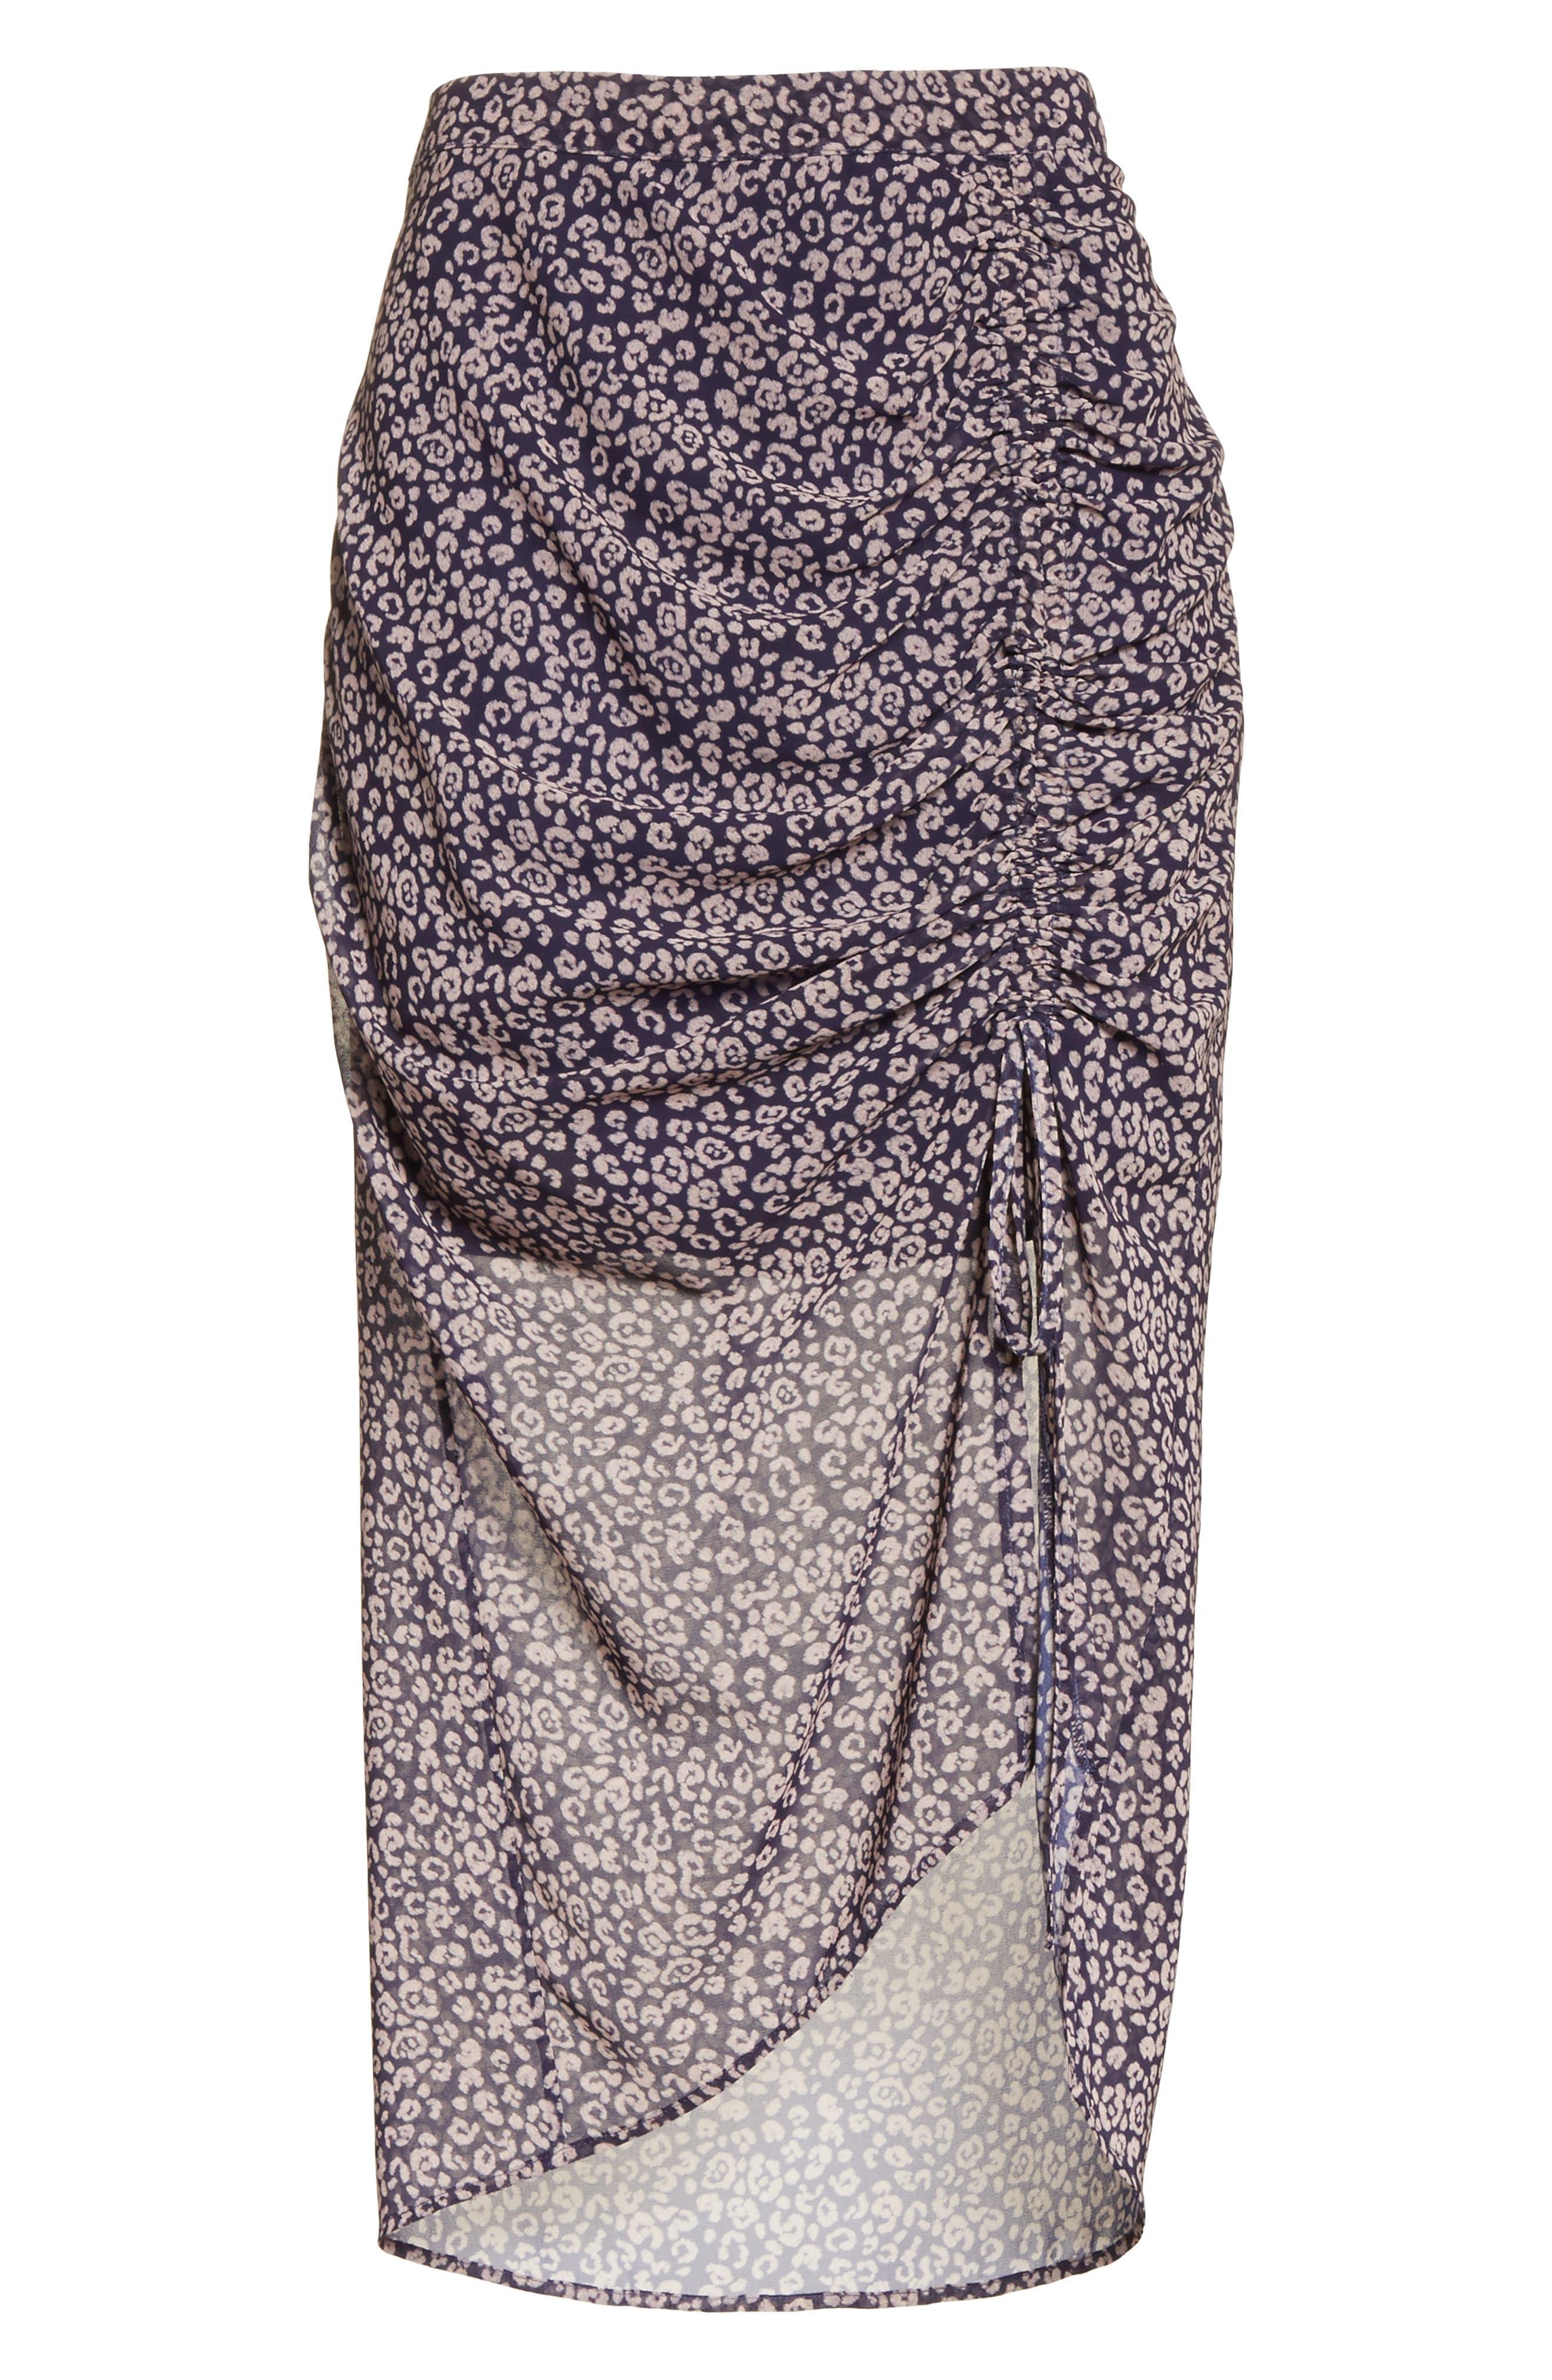 Amaya Skirt,                             Alternate thumbnail 6, color,                             547